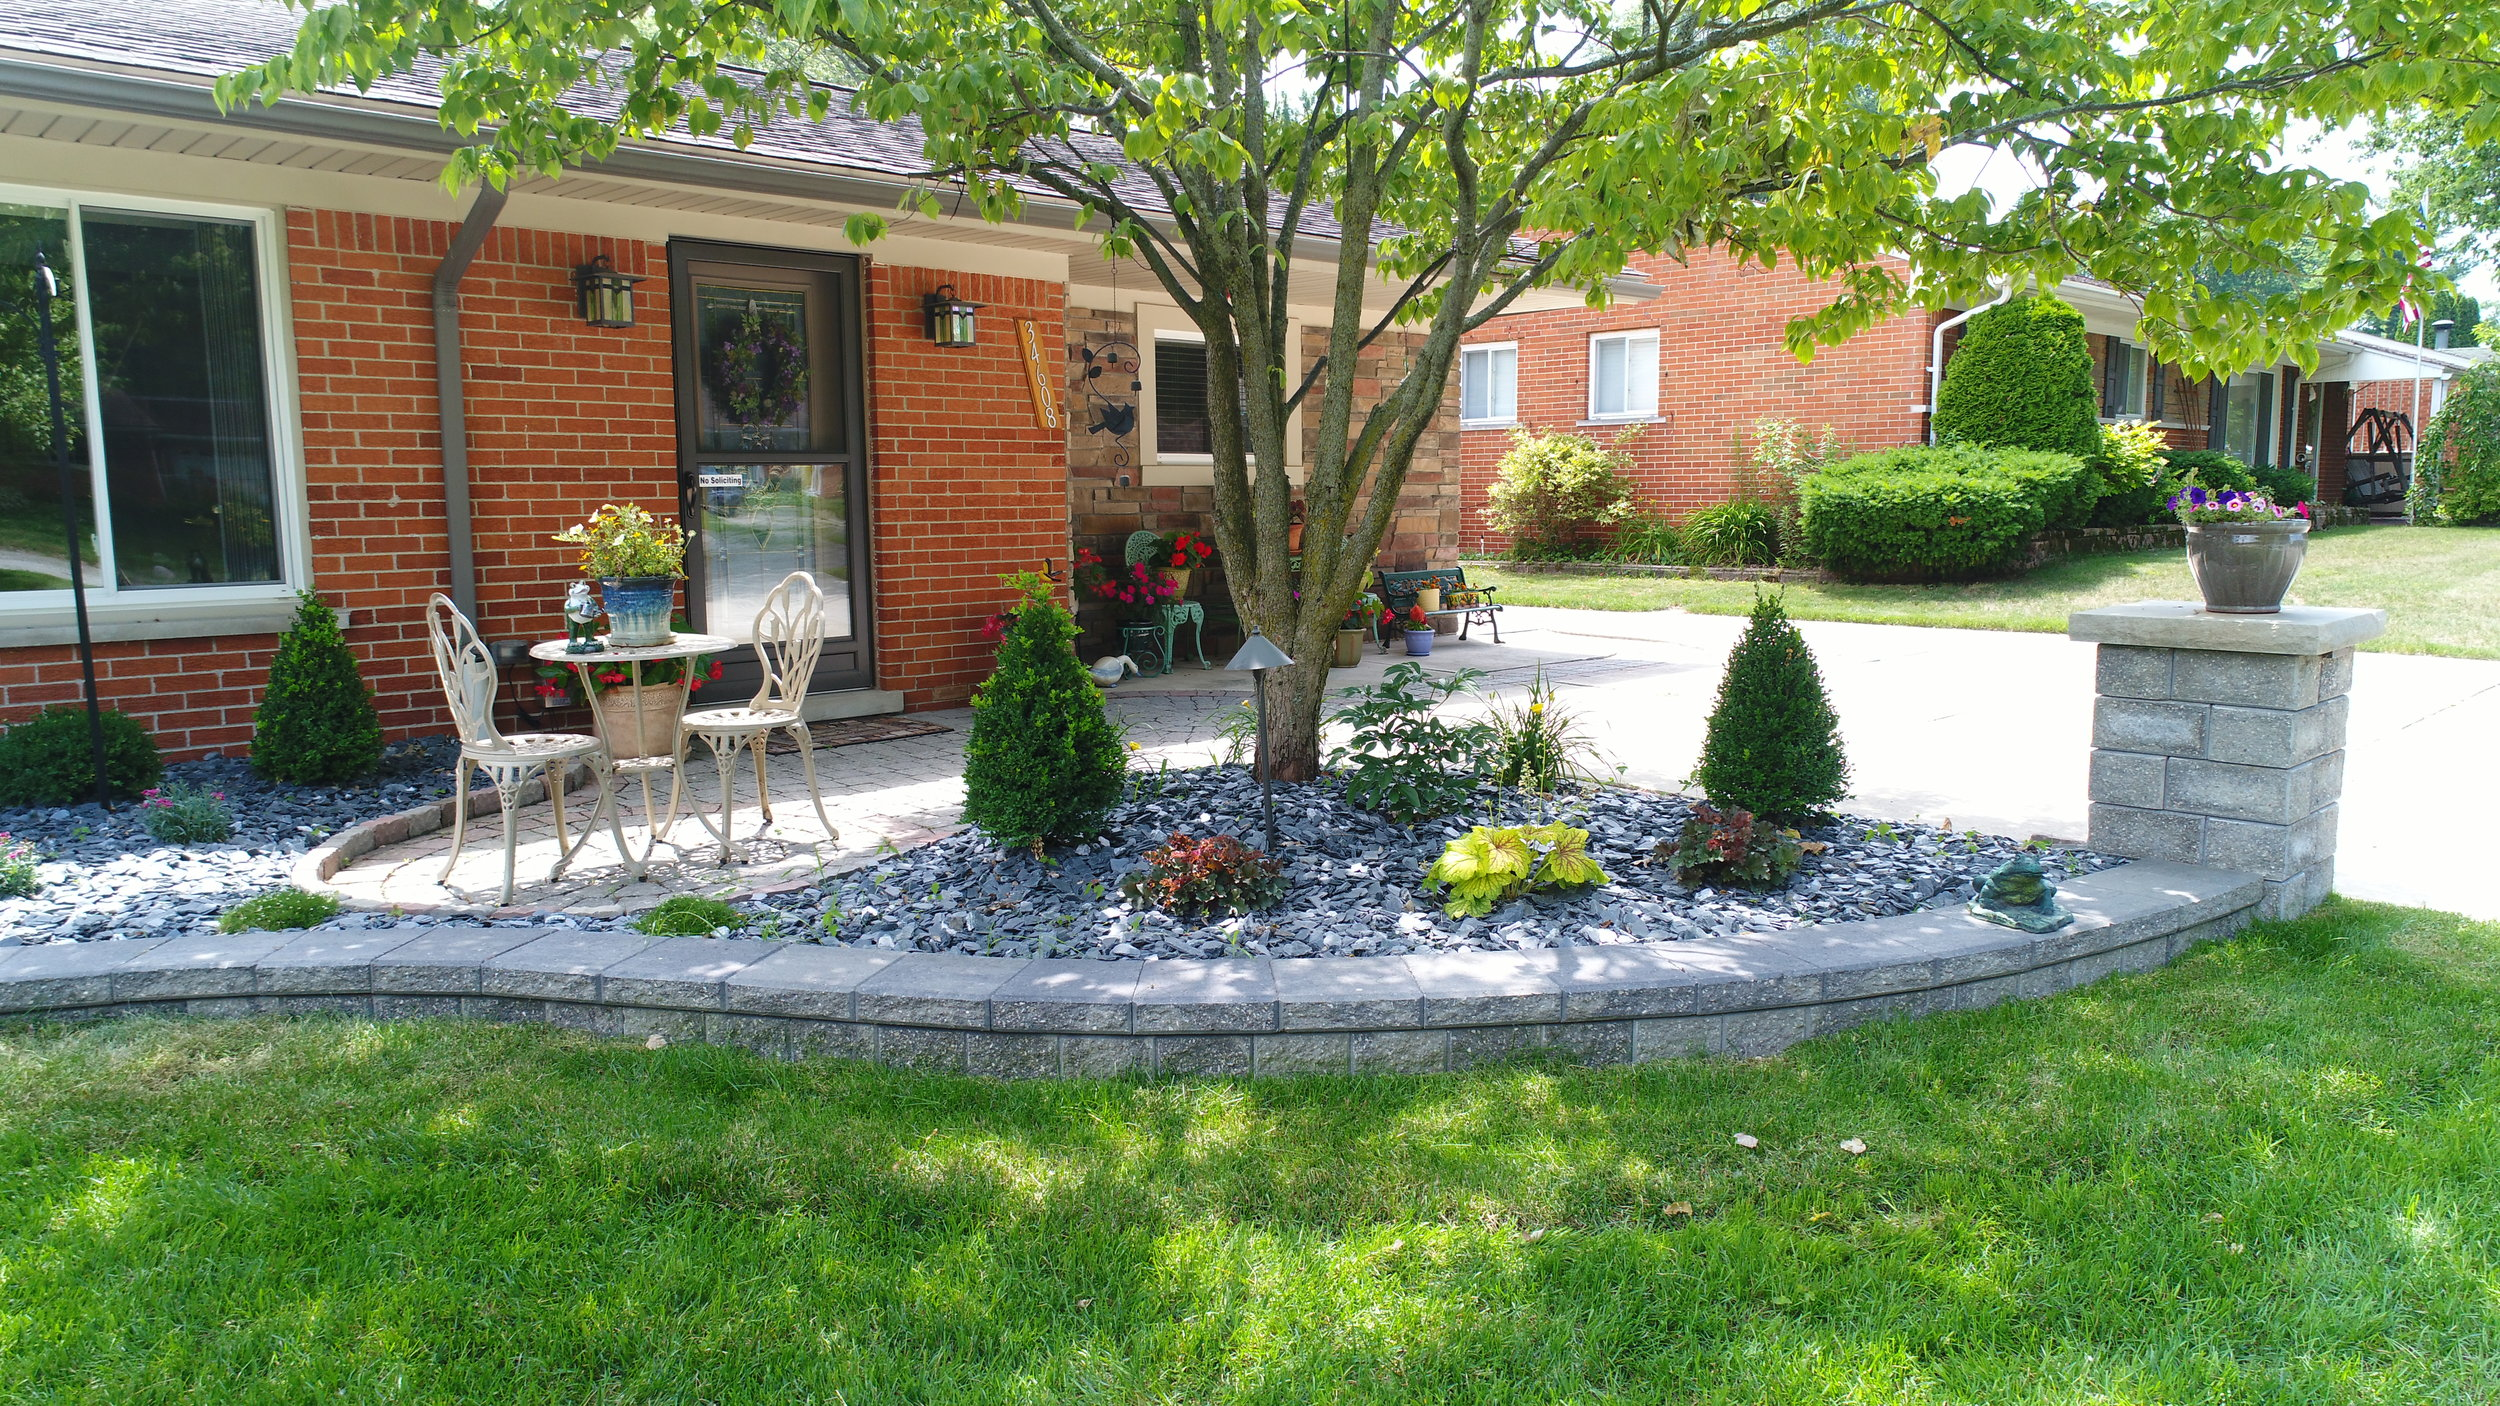 Landscape Design Ideas to Add More Privacy to Your Rochester Hills, MI, Home